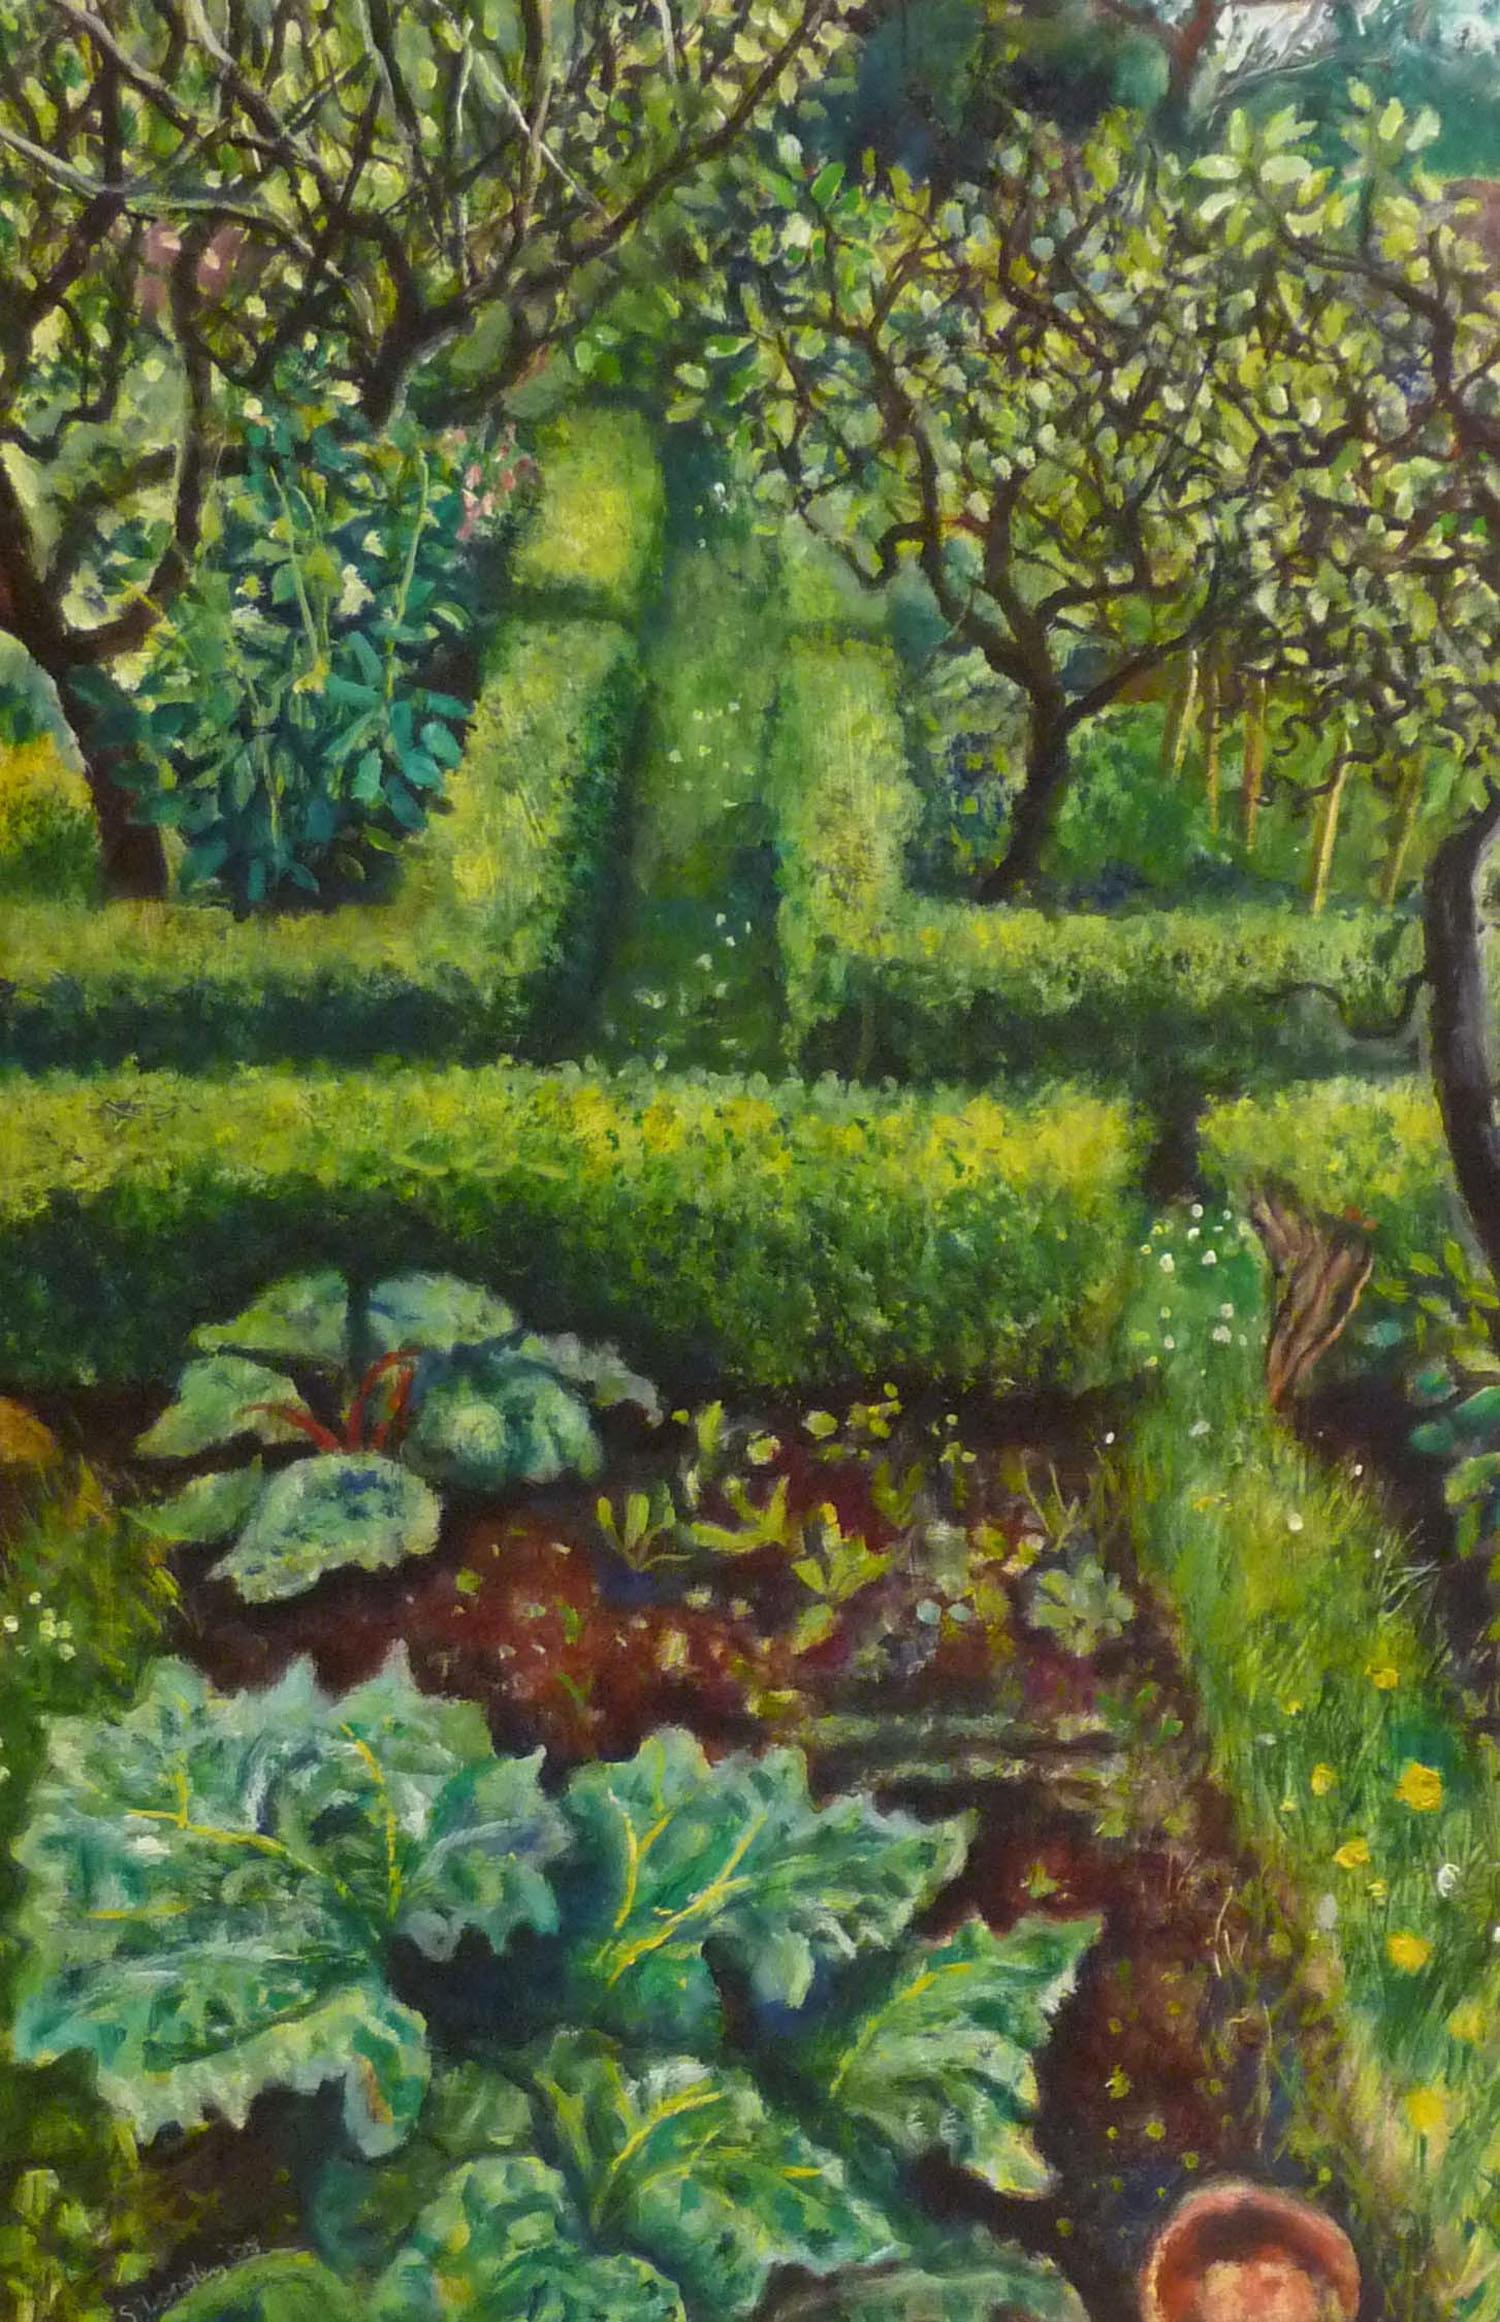 Sarah Longley_-_Rhubarb Plants_oil on board_61 x 41cm.jpg